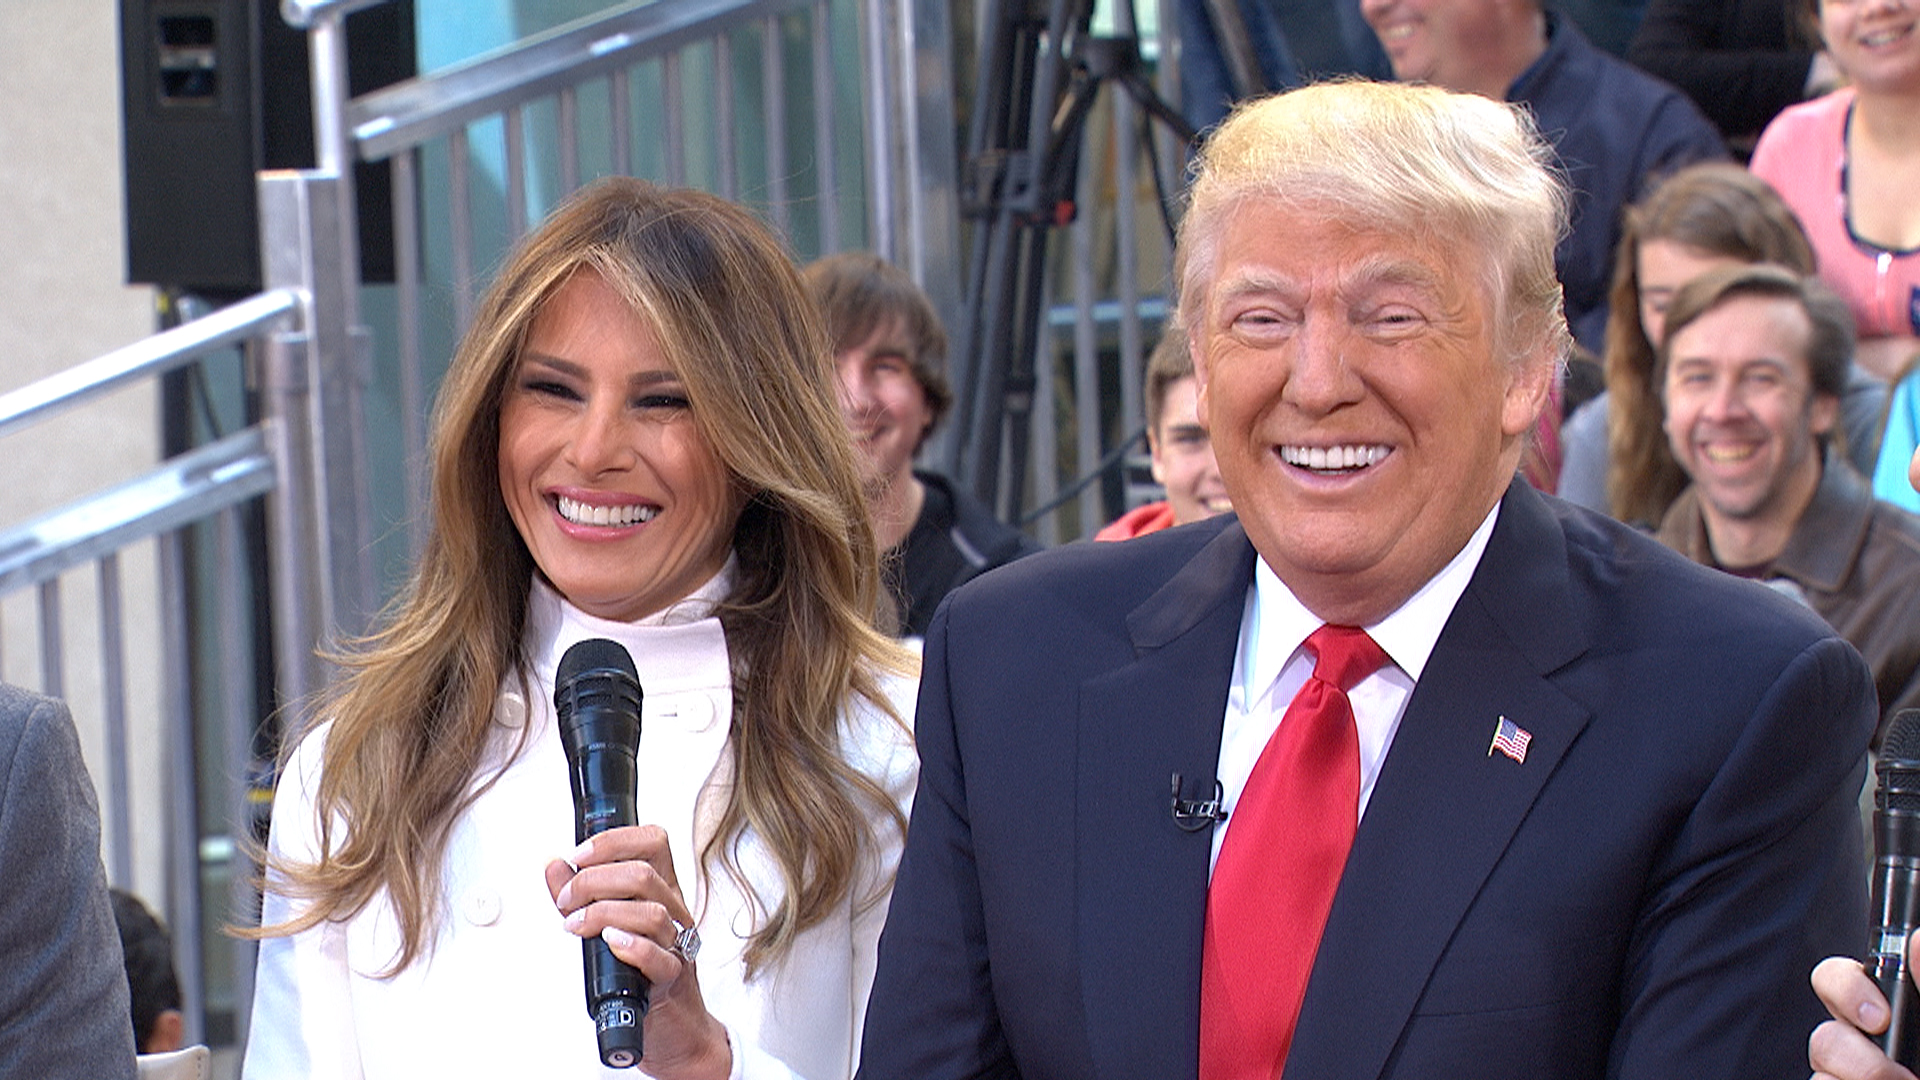 Image result for Trump Melania together